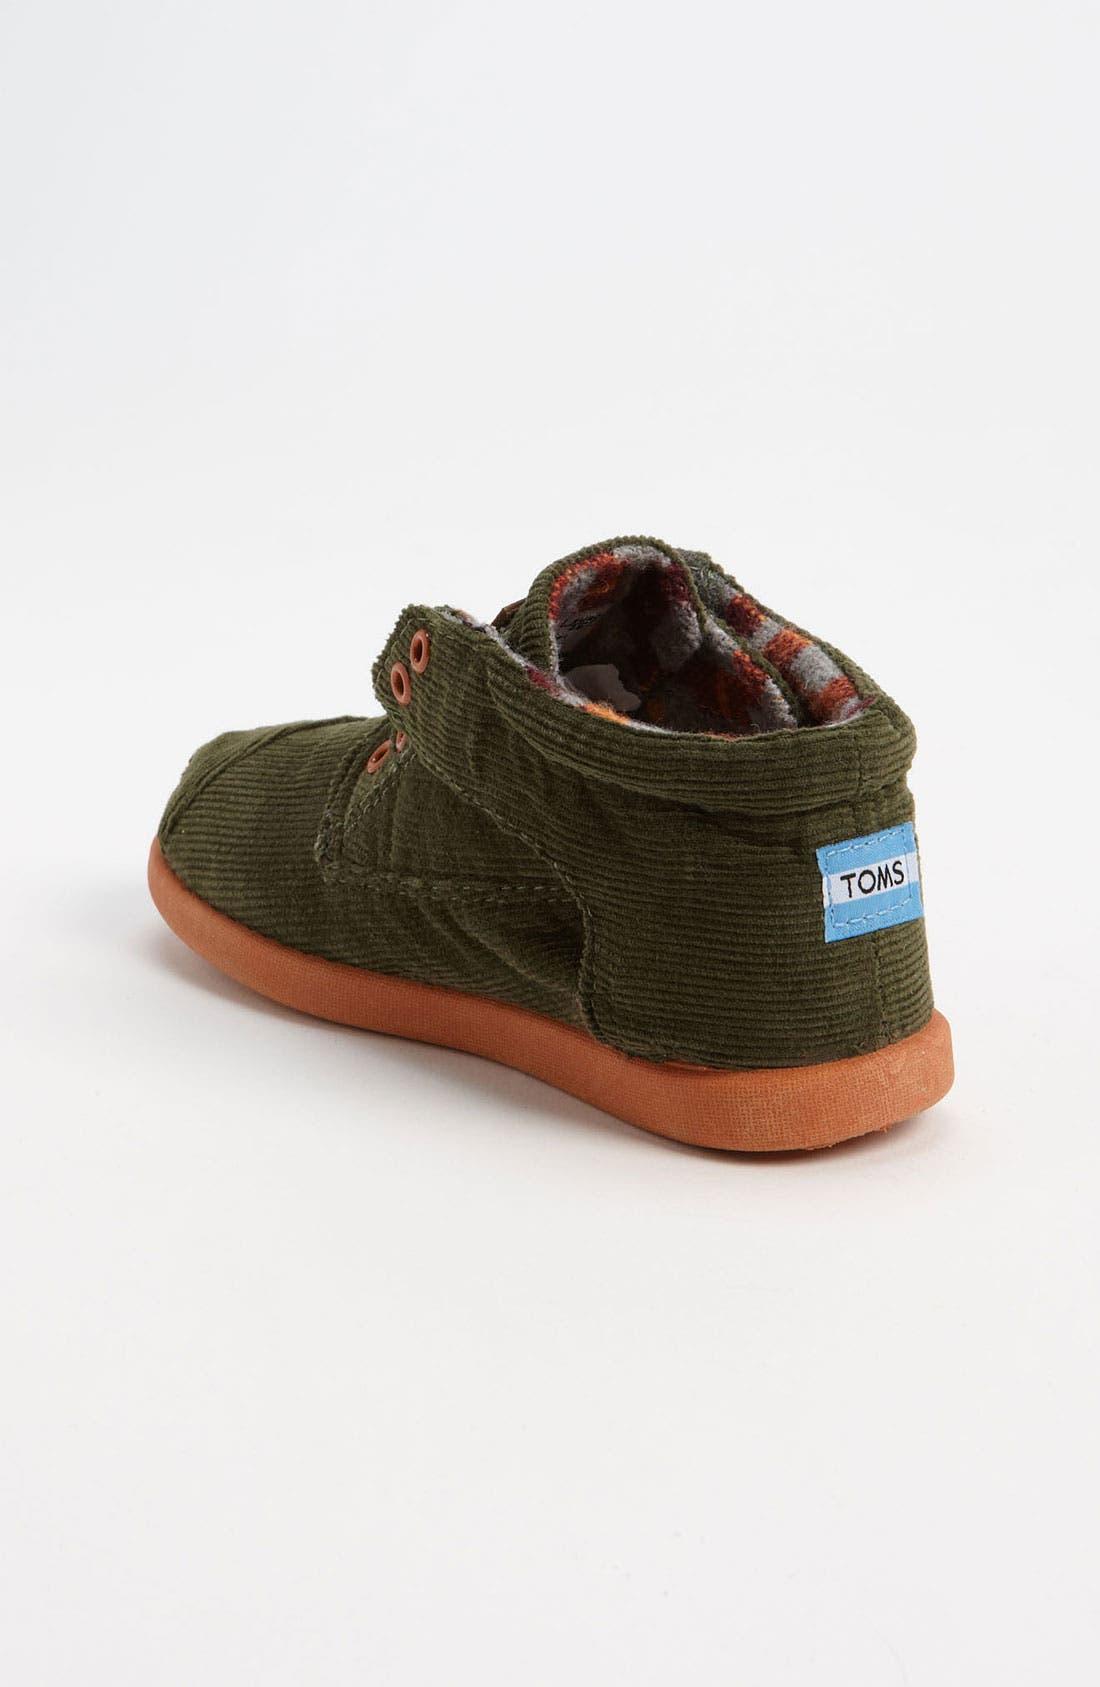 Alternate Image 2  - TOMS 'Botas' Corduroy Boot (Baby, Walker & Toddler)